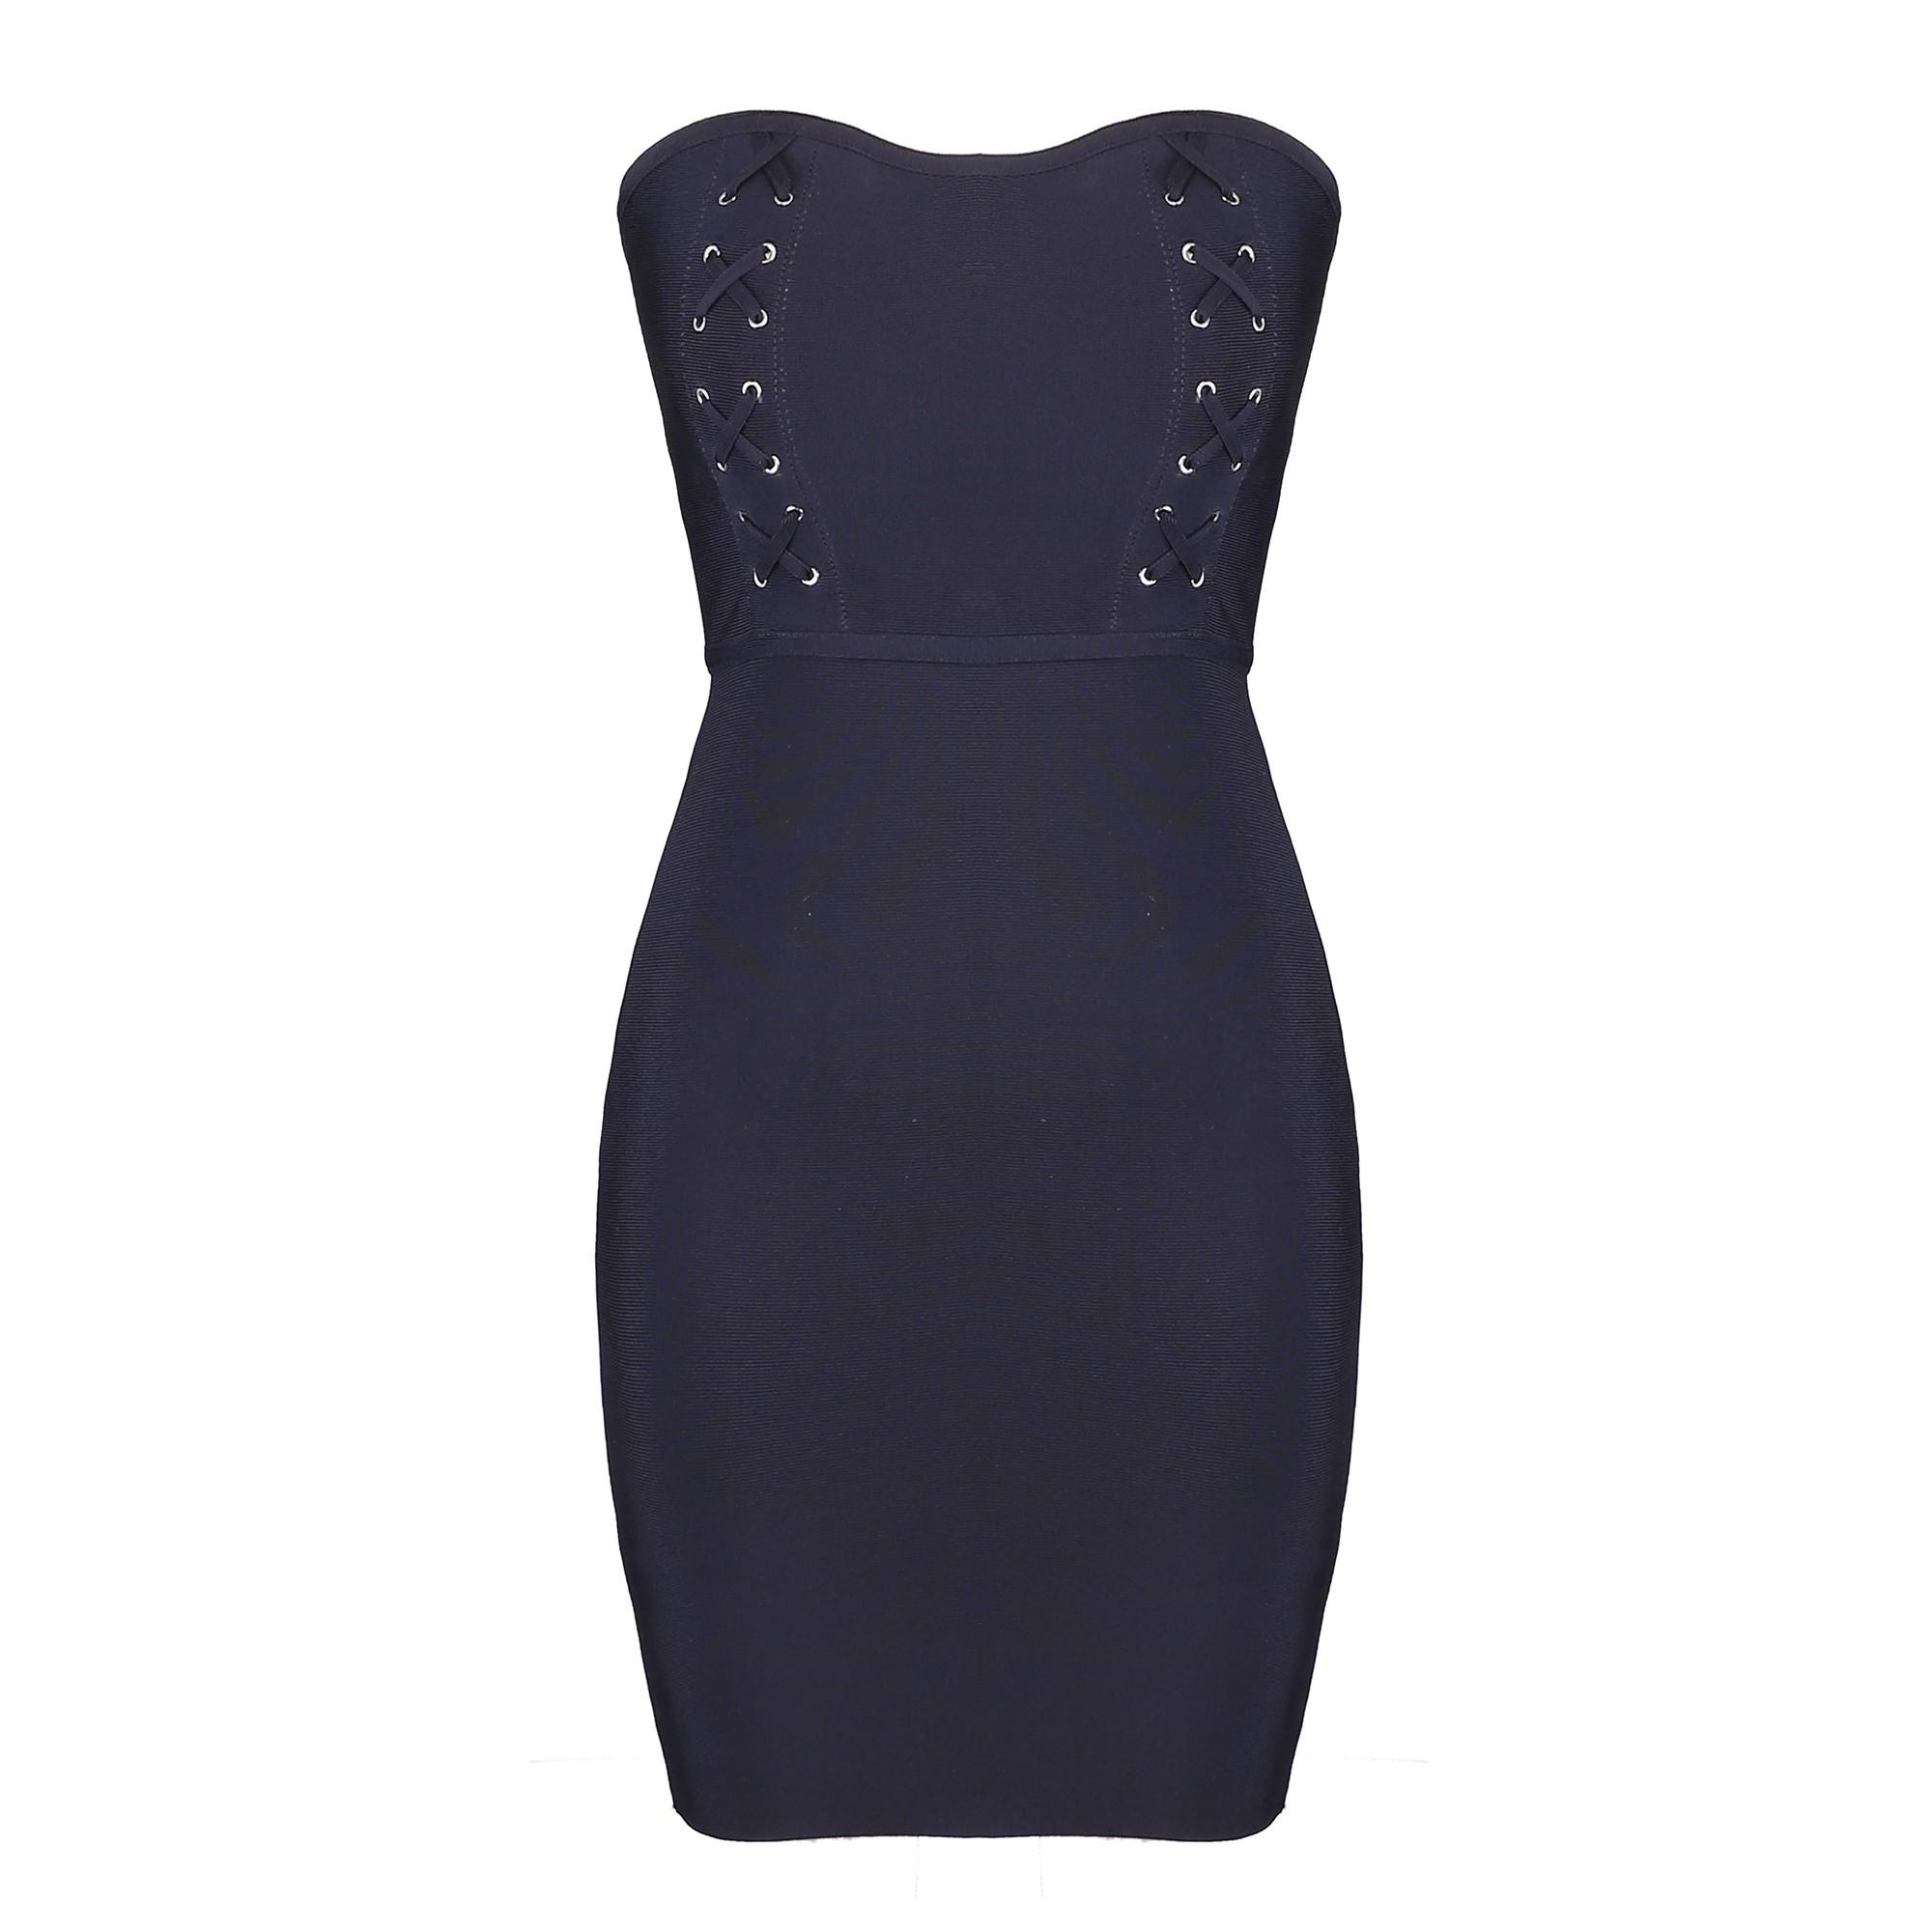 Rayon - Black Strapless Sleeveless Mini Metal Studded Lace Up Sexy Bandage Dress H0110-Black